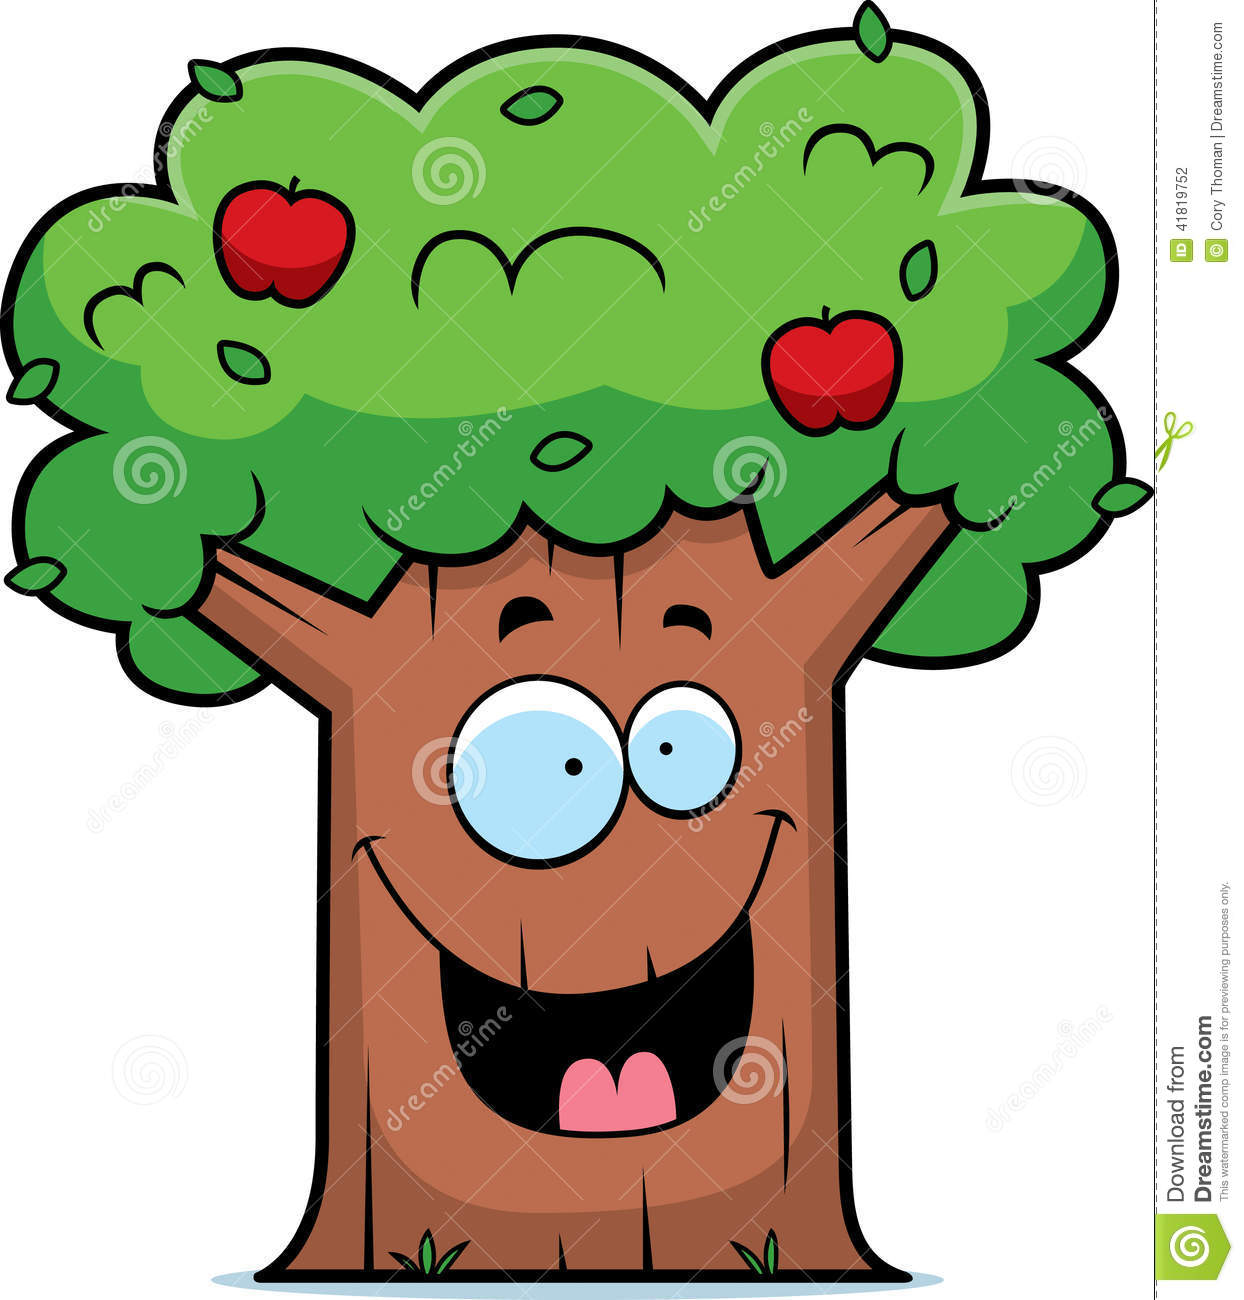 1244x1300 Pictures Apple Tree Cartoon Image,